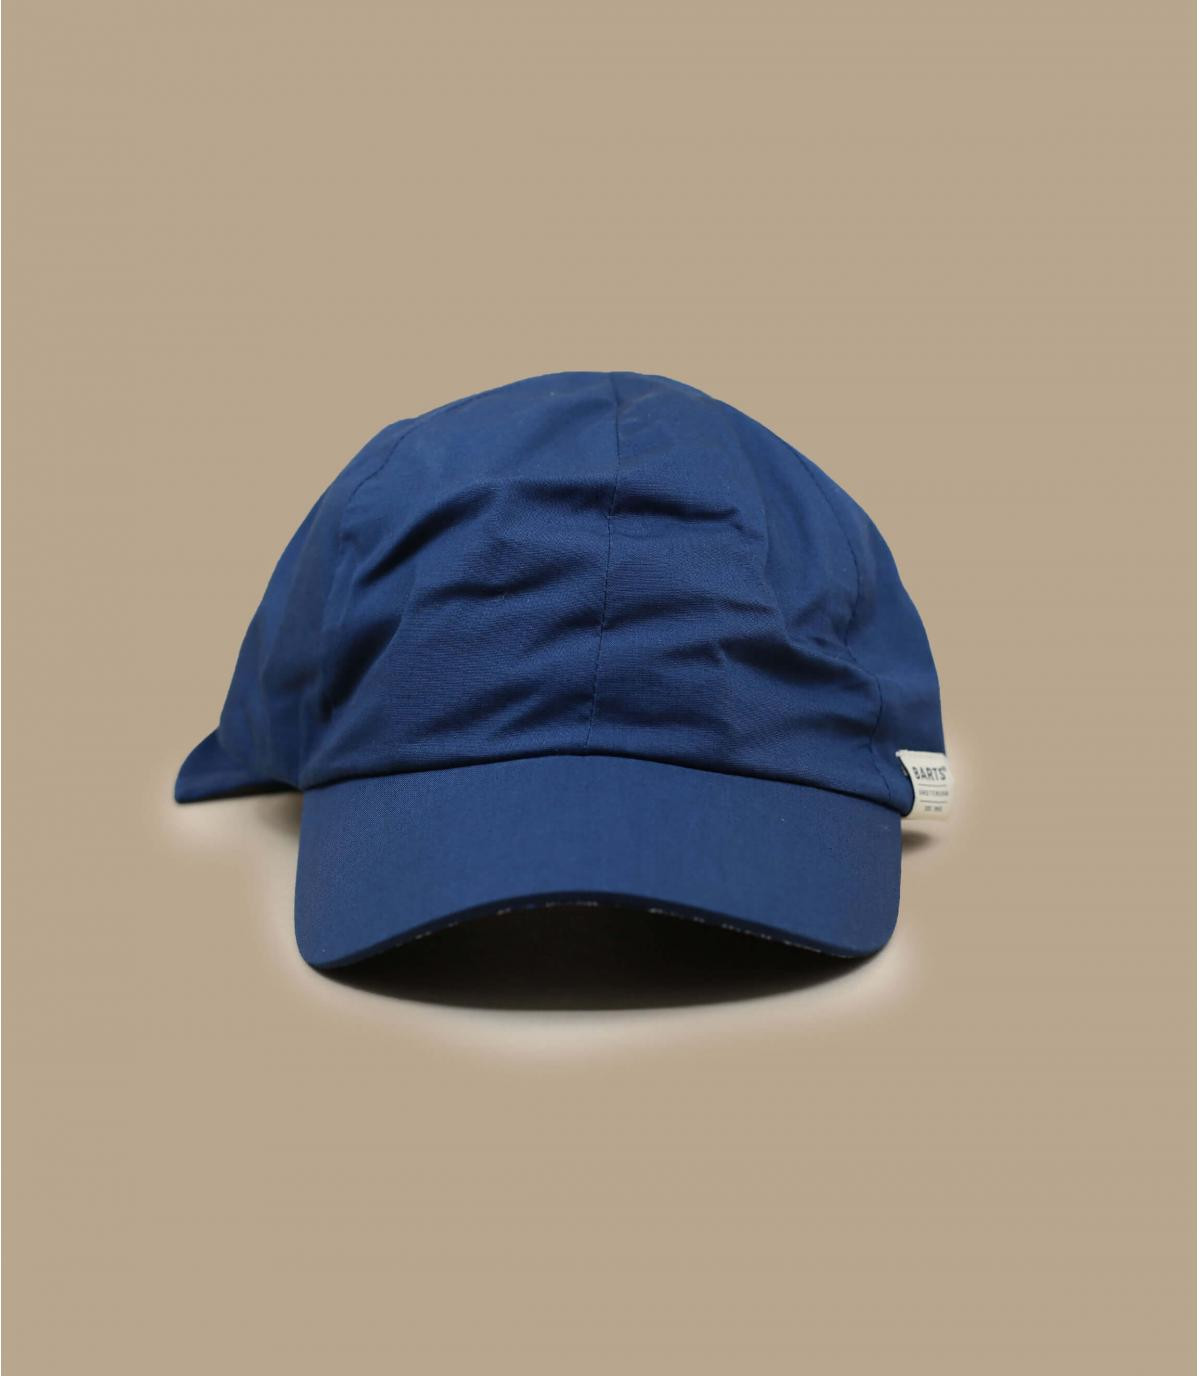 Gorra mujer azul marino